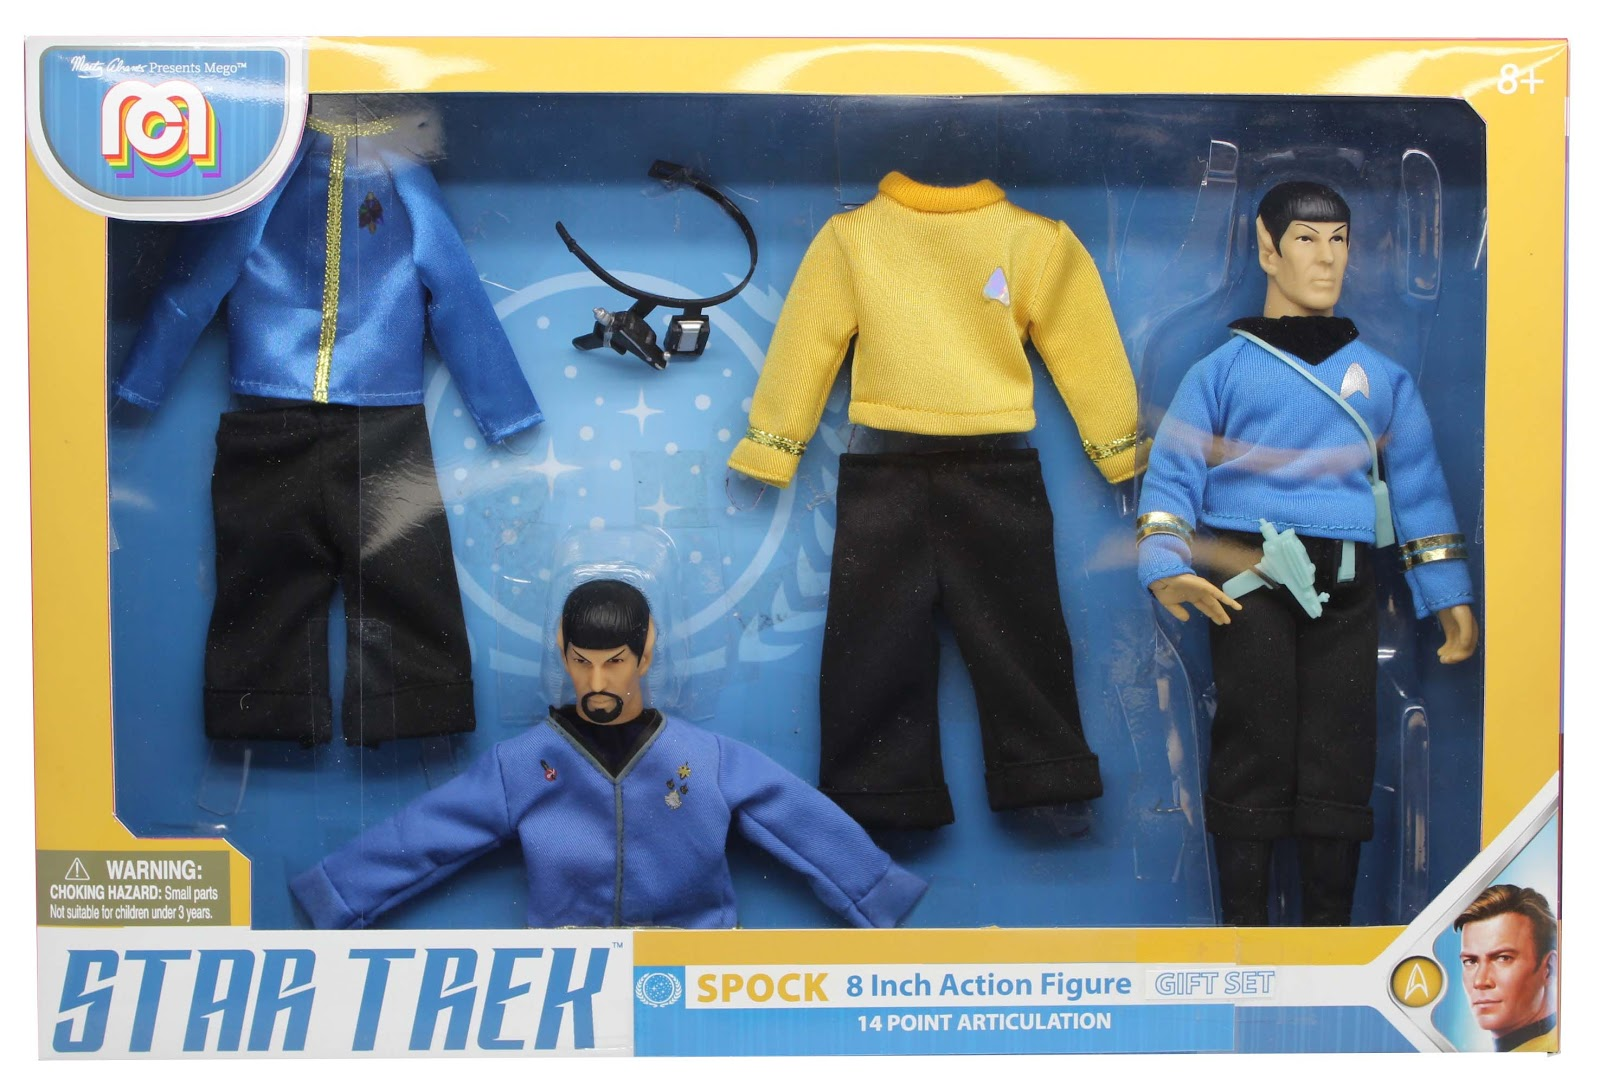 - Star Trek PICARD FIGURE Model Figurine CBS Studios mint boxes gift statue